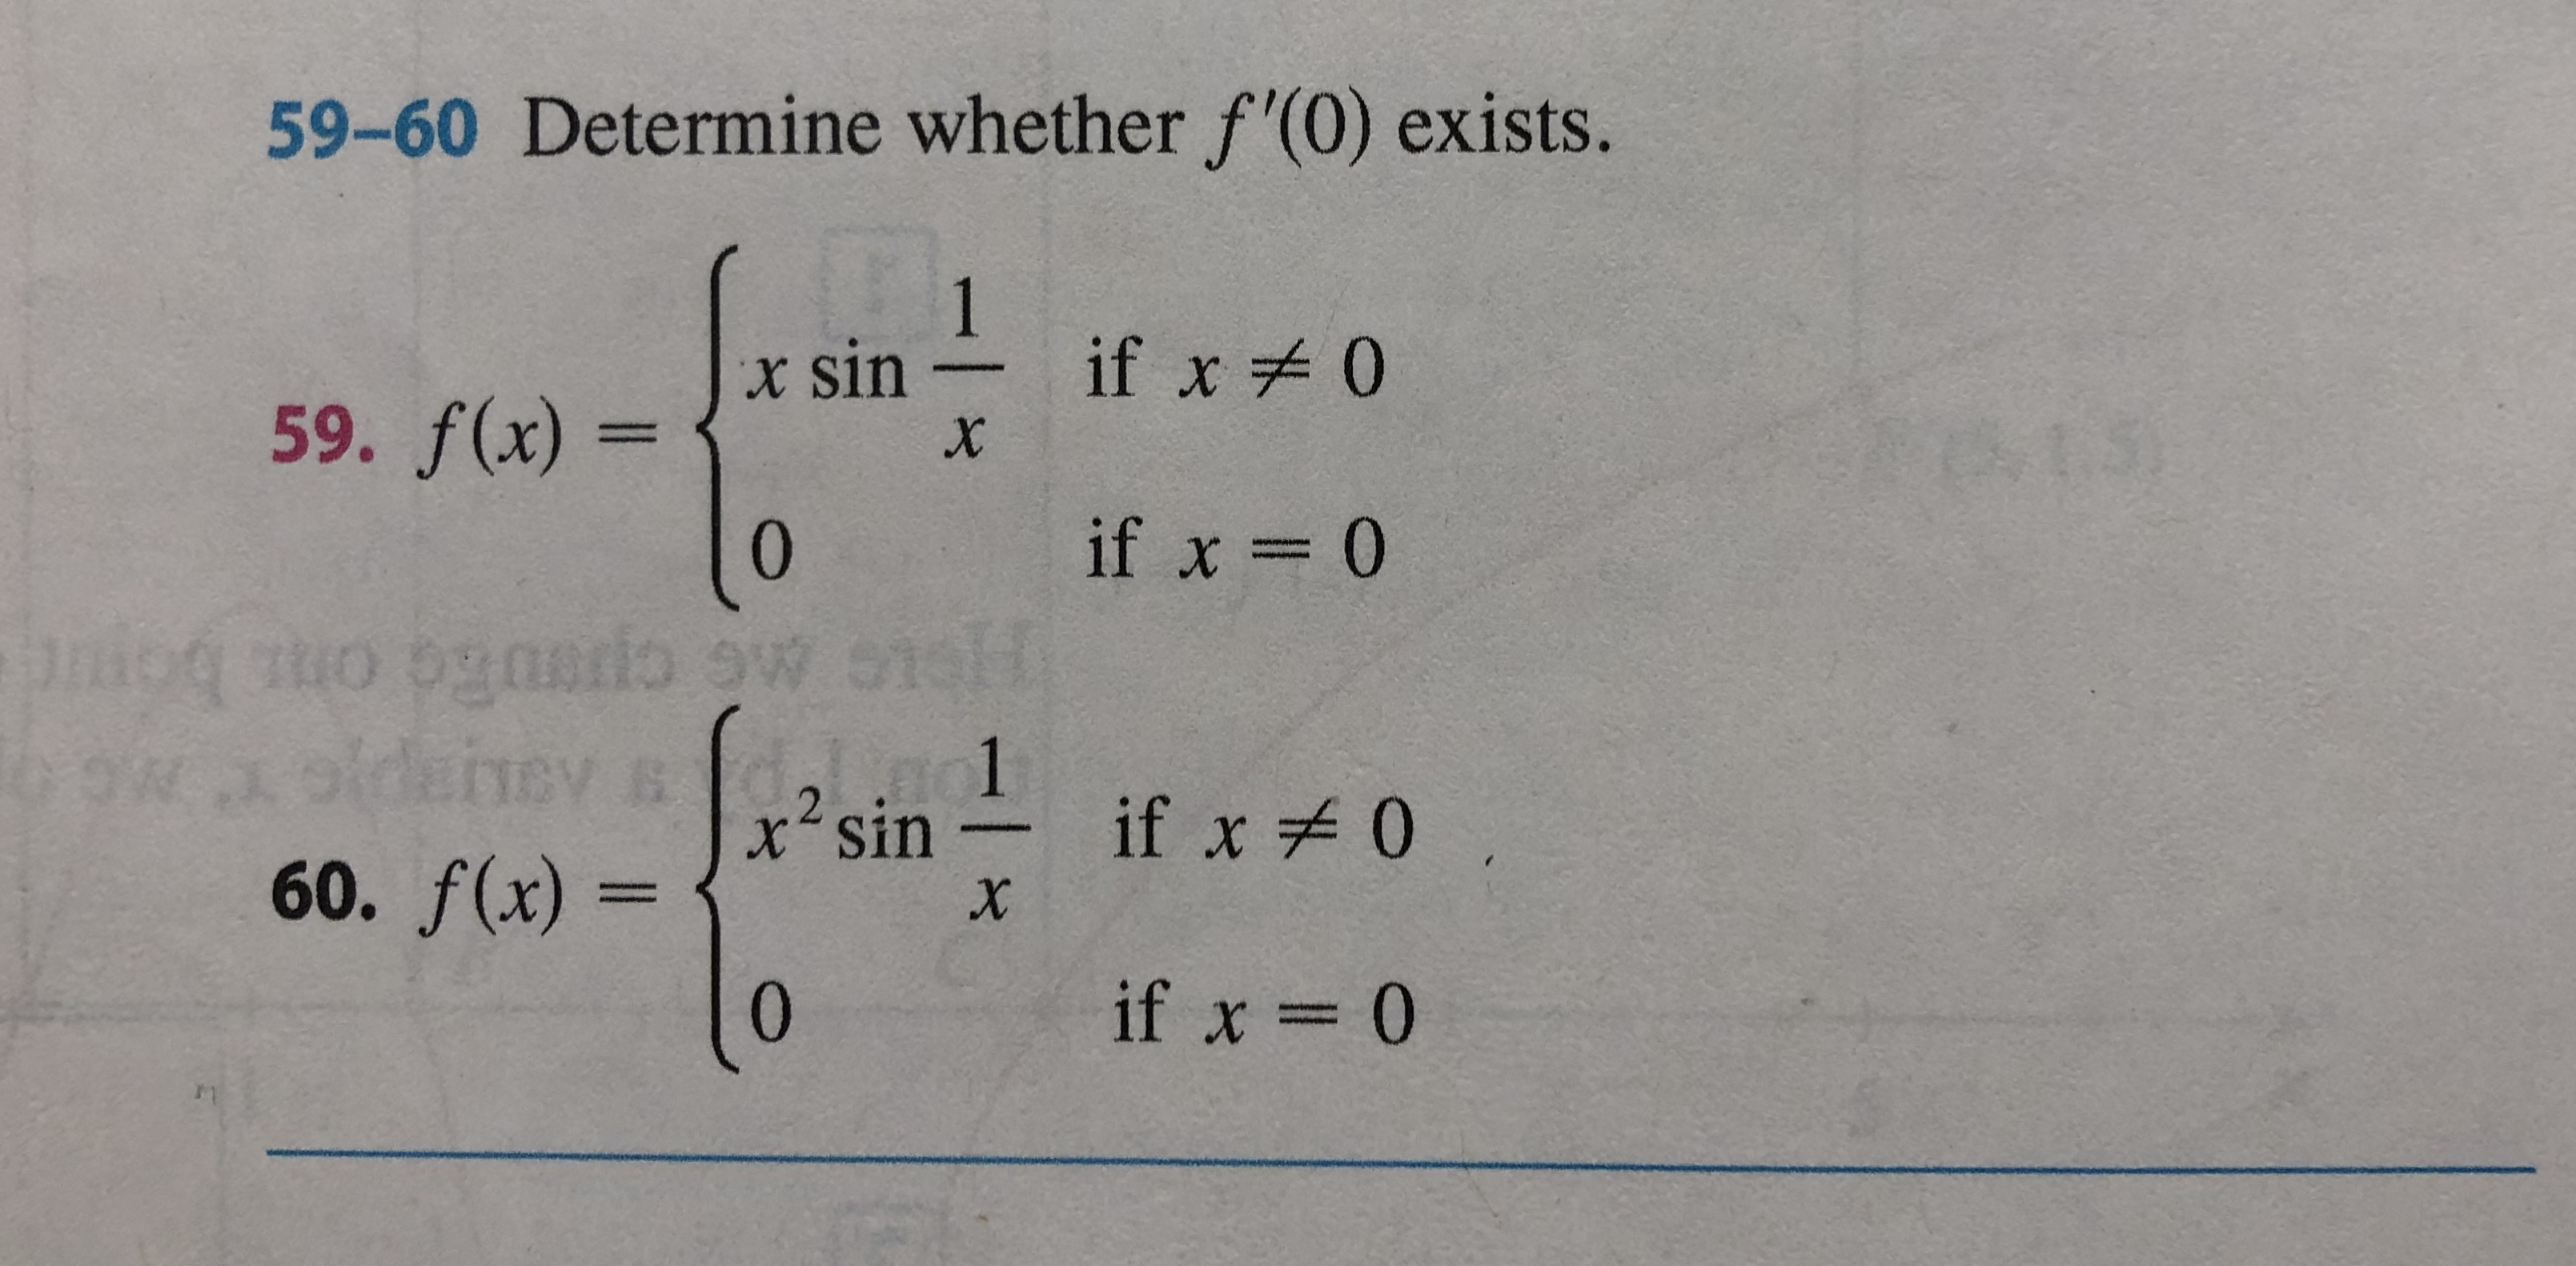 59-60 Determine whether f'(0) exists. if x 0 sin 59. f(x)= х if x 0 o pgno 9W 6161 idess 60. f(x)= xsin if x 0 х if x 0